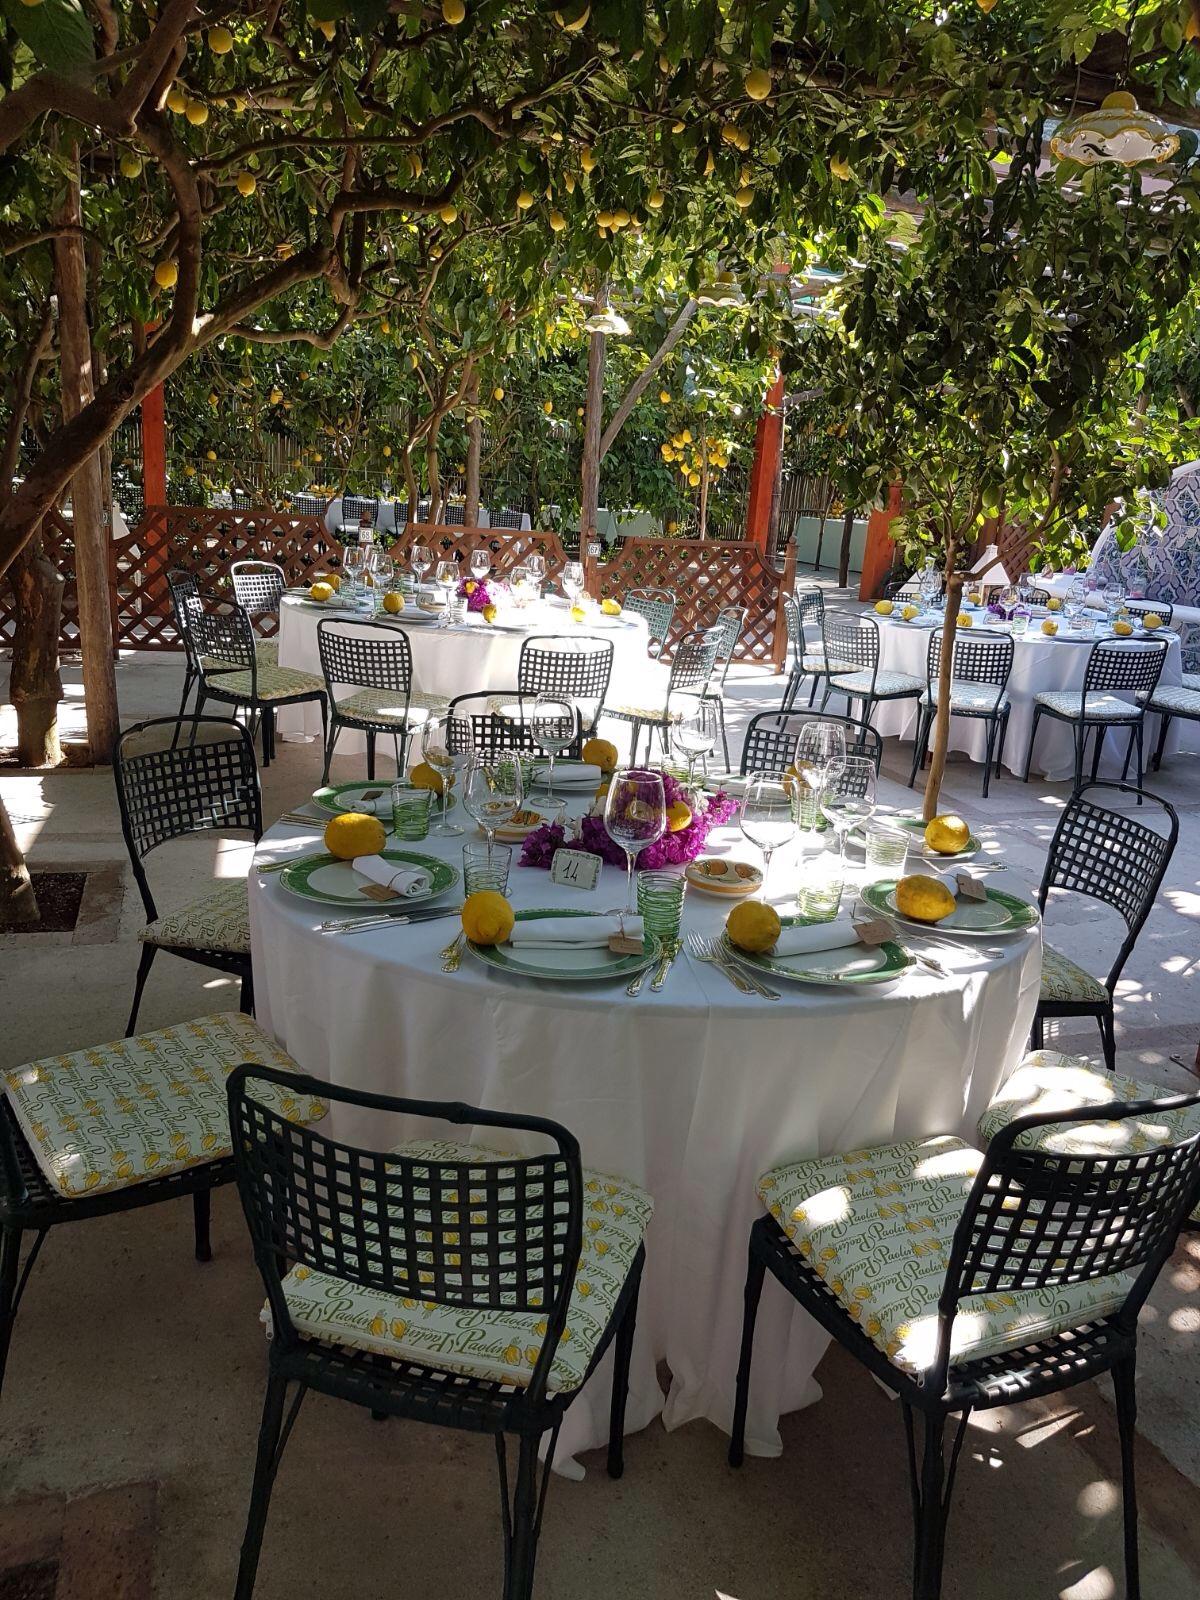 https://www.weddingamalfi.com/wp-content/uploads/Nathalie-and-Benjamin-wedding-day-in-Positano-6.jpg